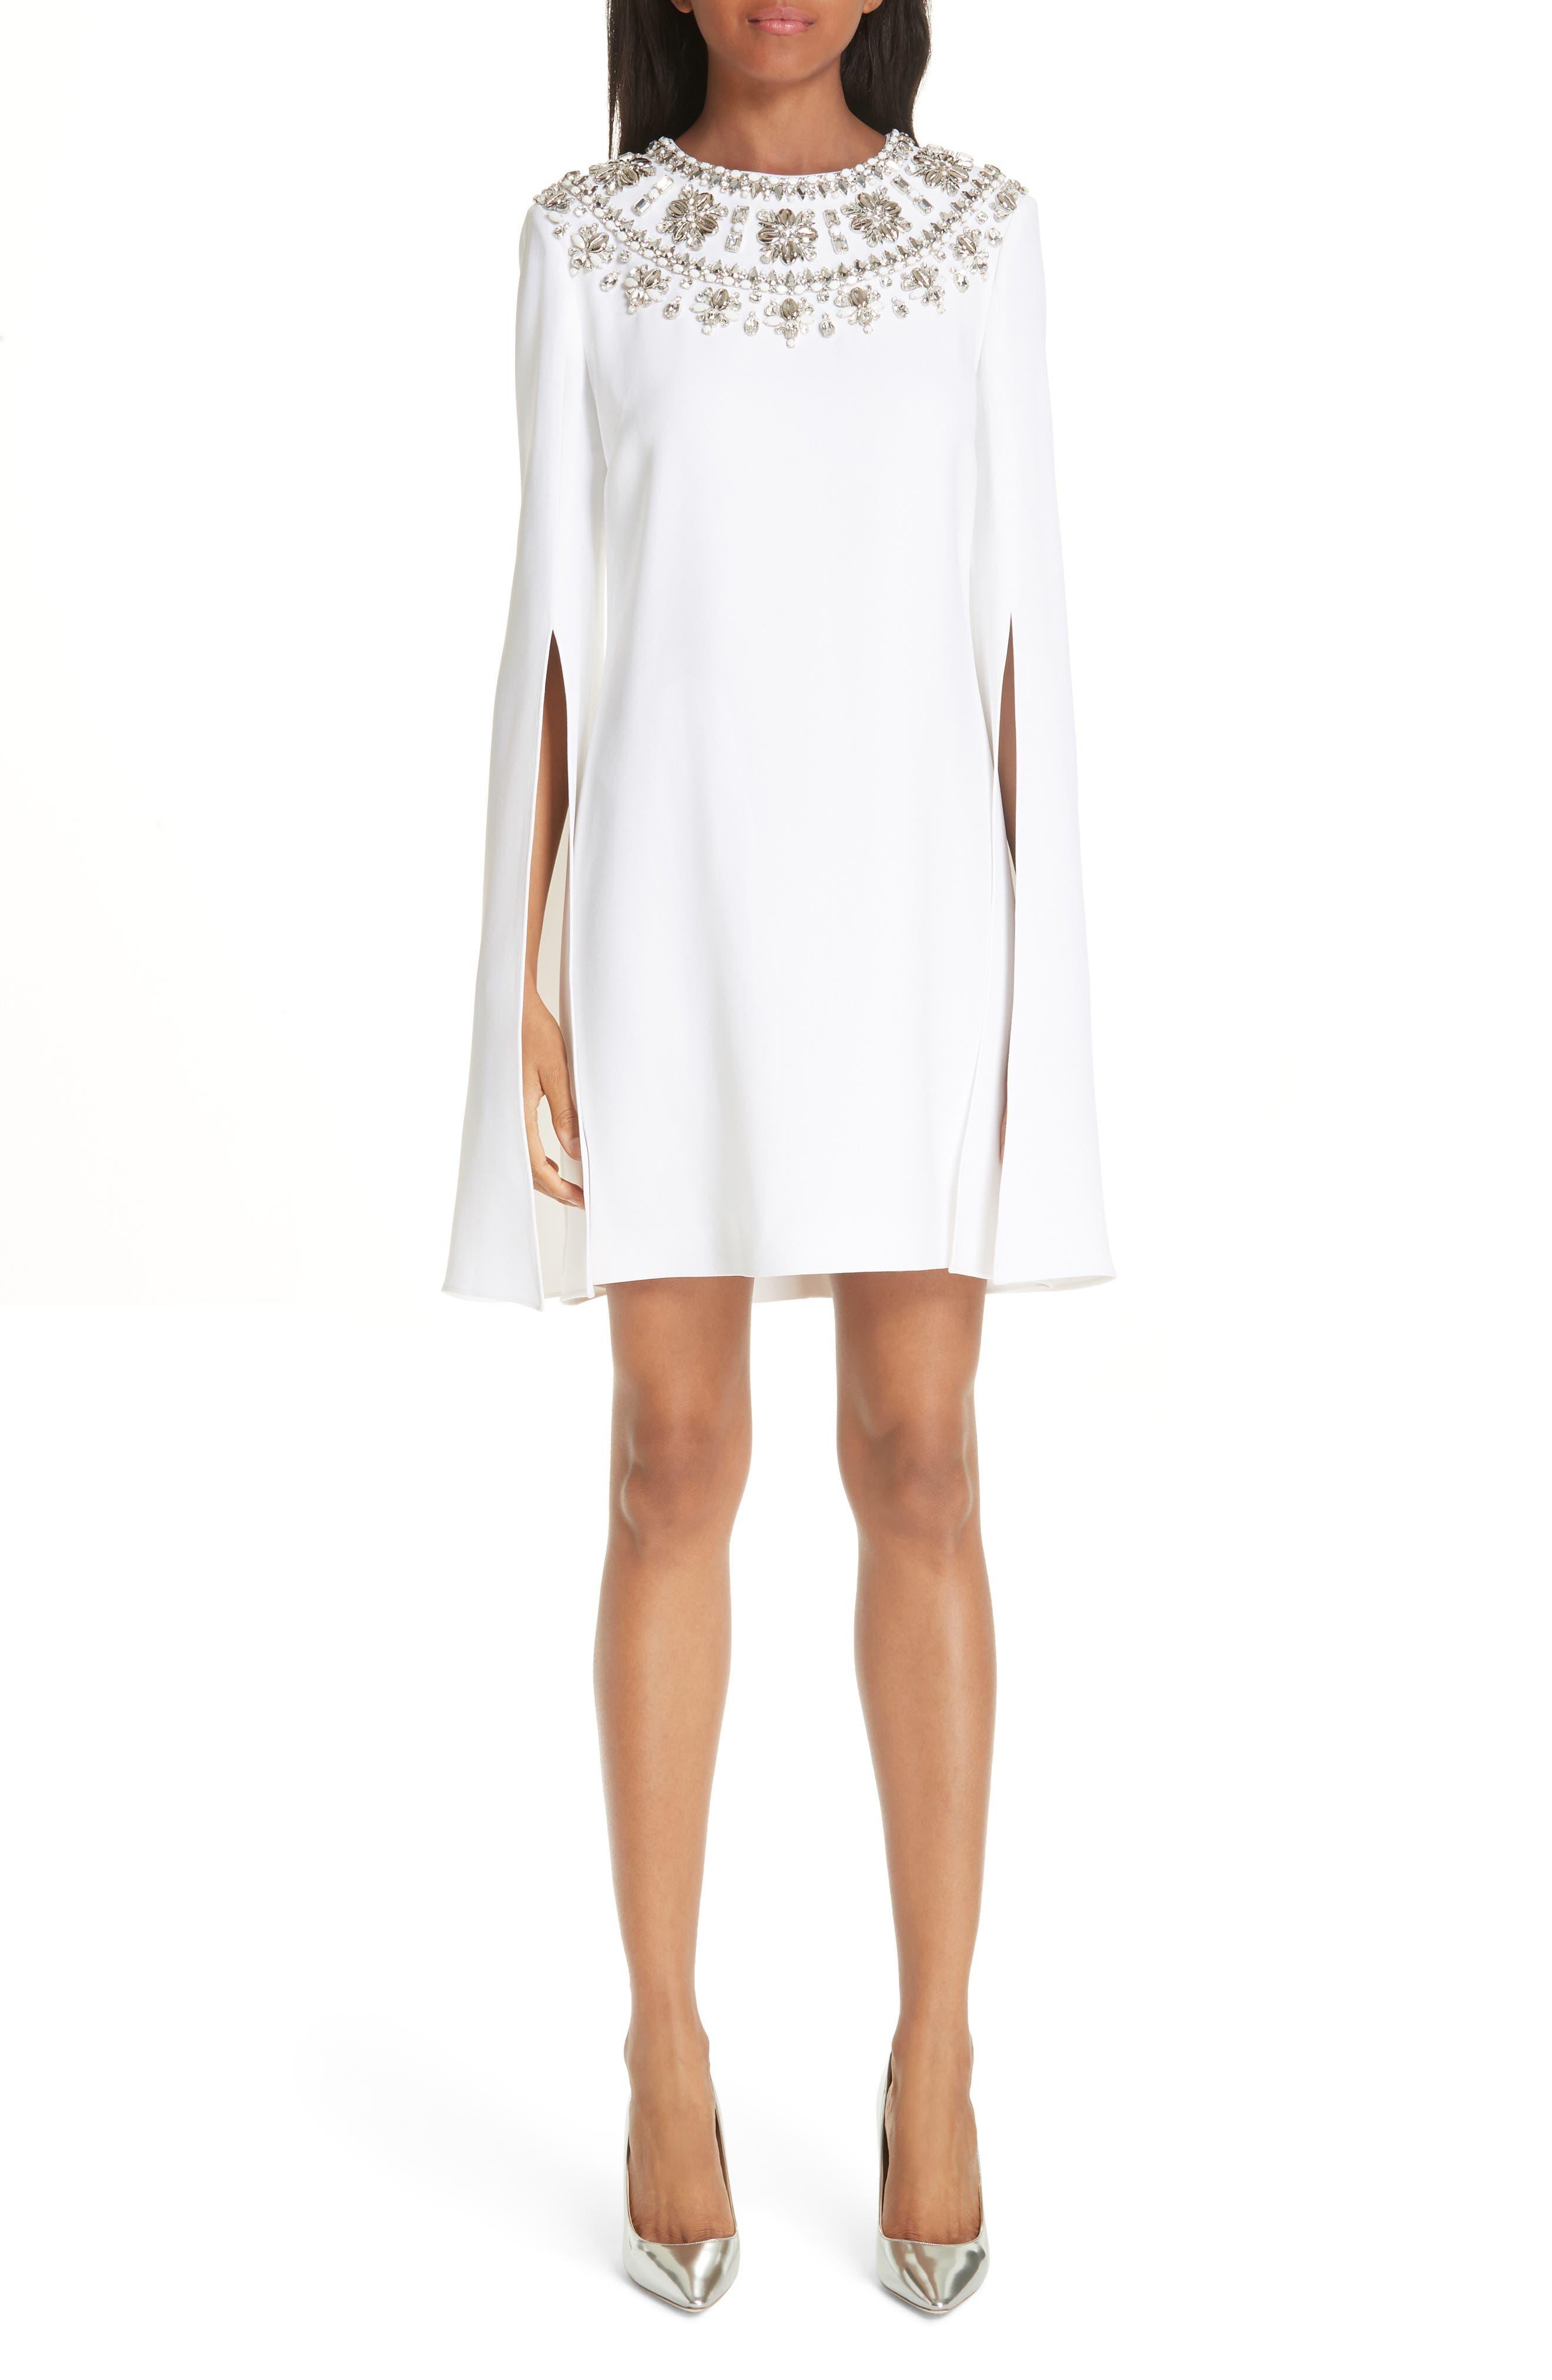 MICHAEL KORS Crystal Embellished Split Sleeve Double Crepe Sable Dress, Main, color, OPTIC WHITE W/ SILVER